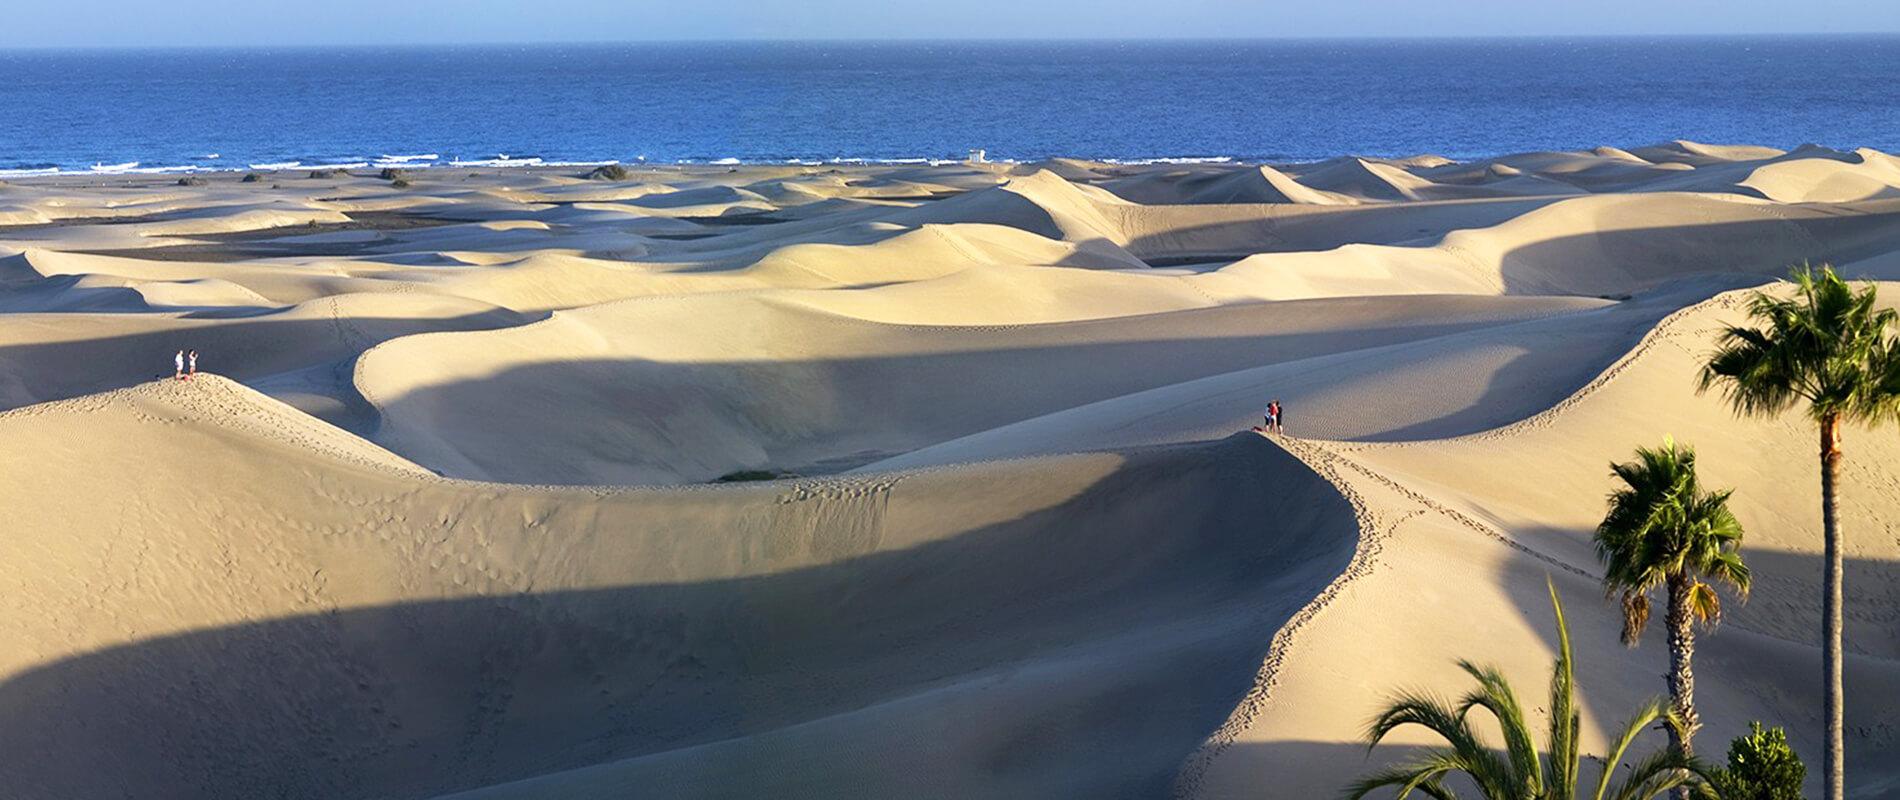 Maspalomas, the magic of the sand dunes of Grand Canary Island